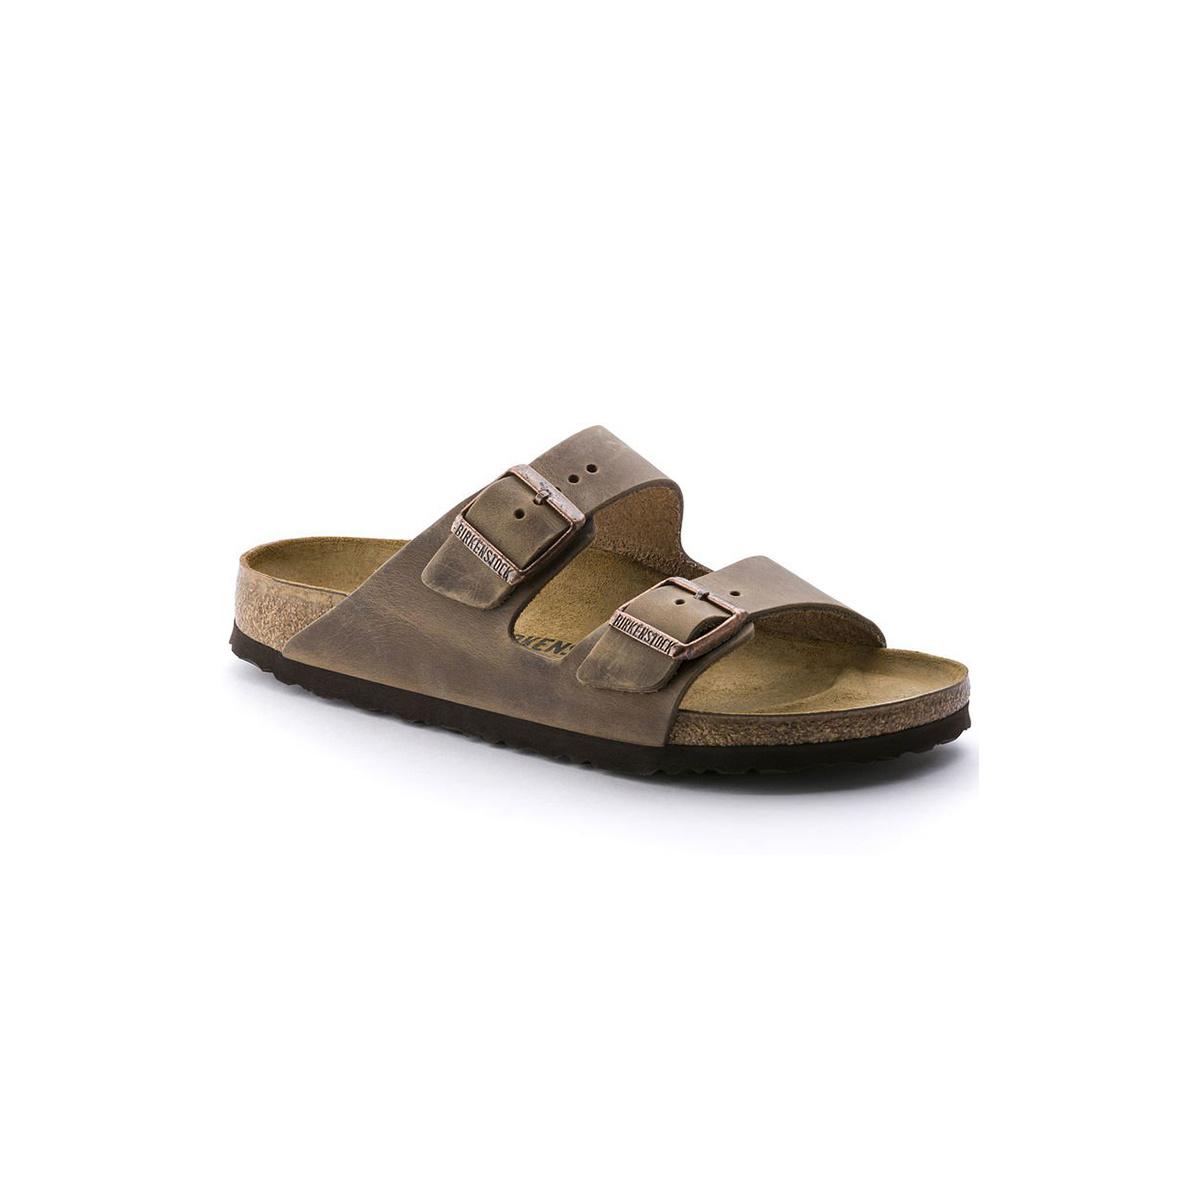 Birkenstock Arizona Soft Footbed Oiled Leather-Narrow